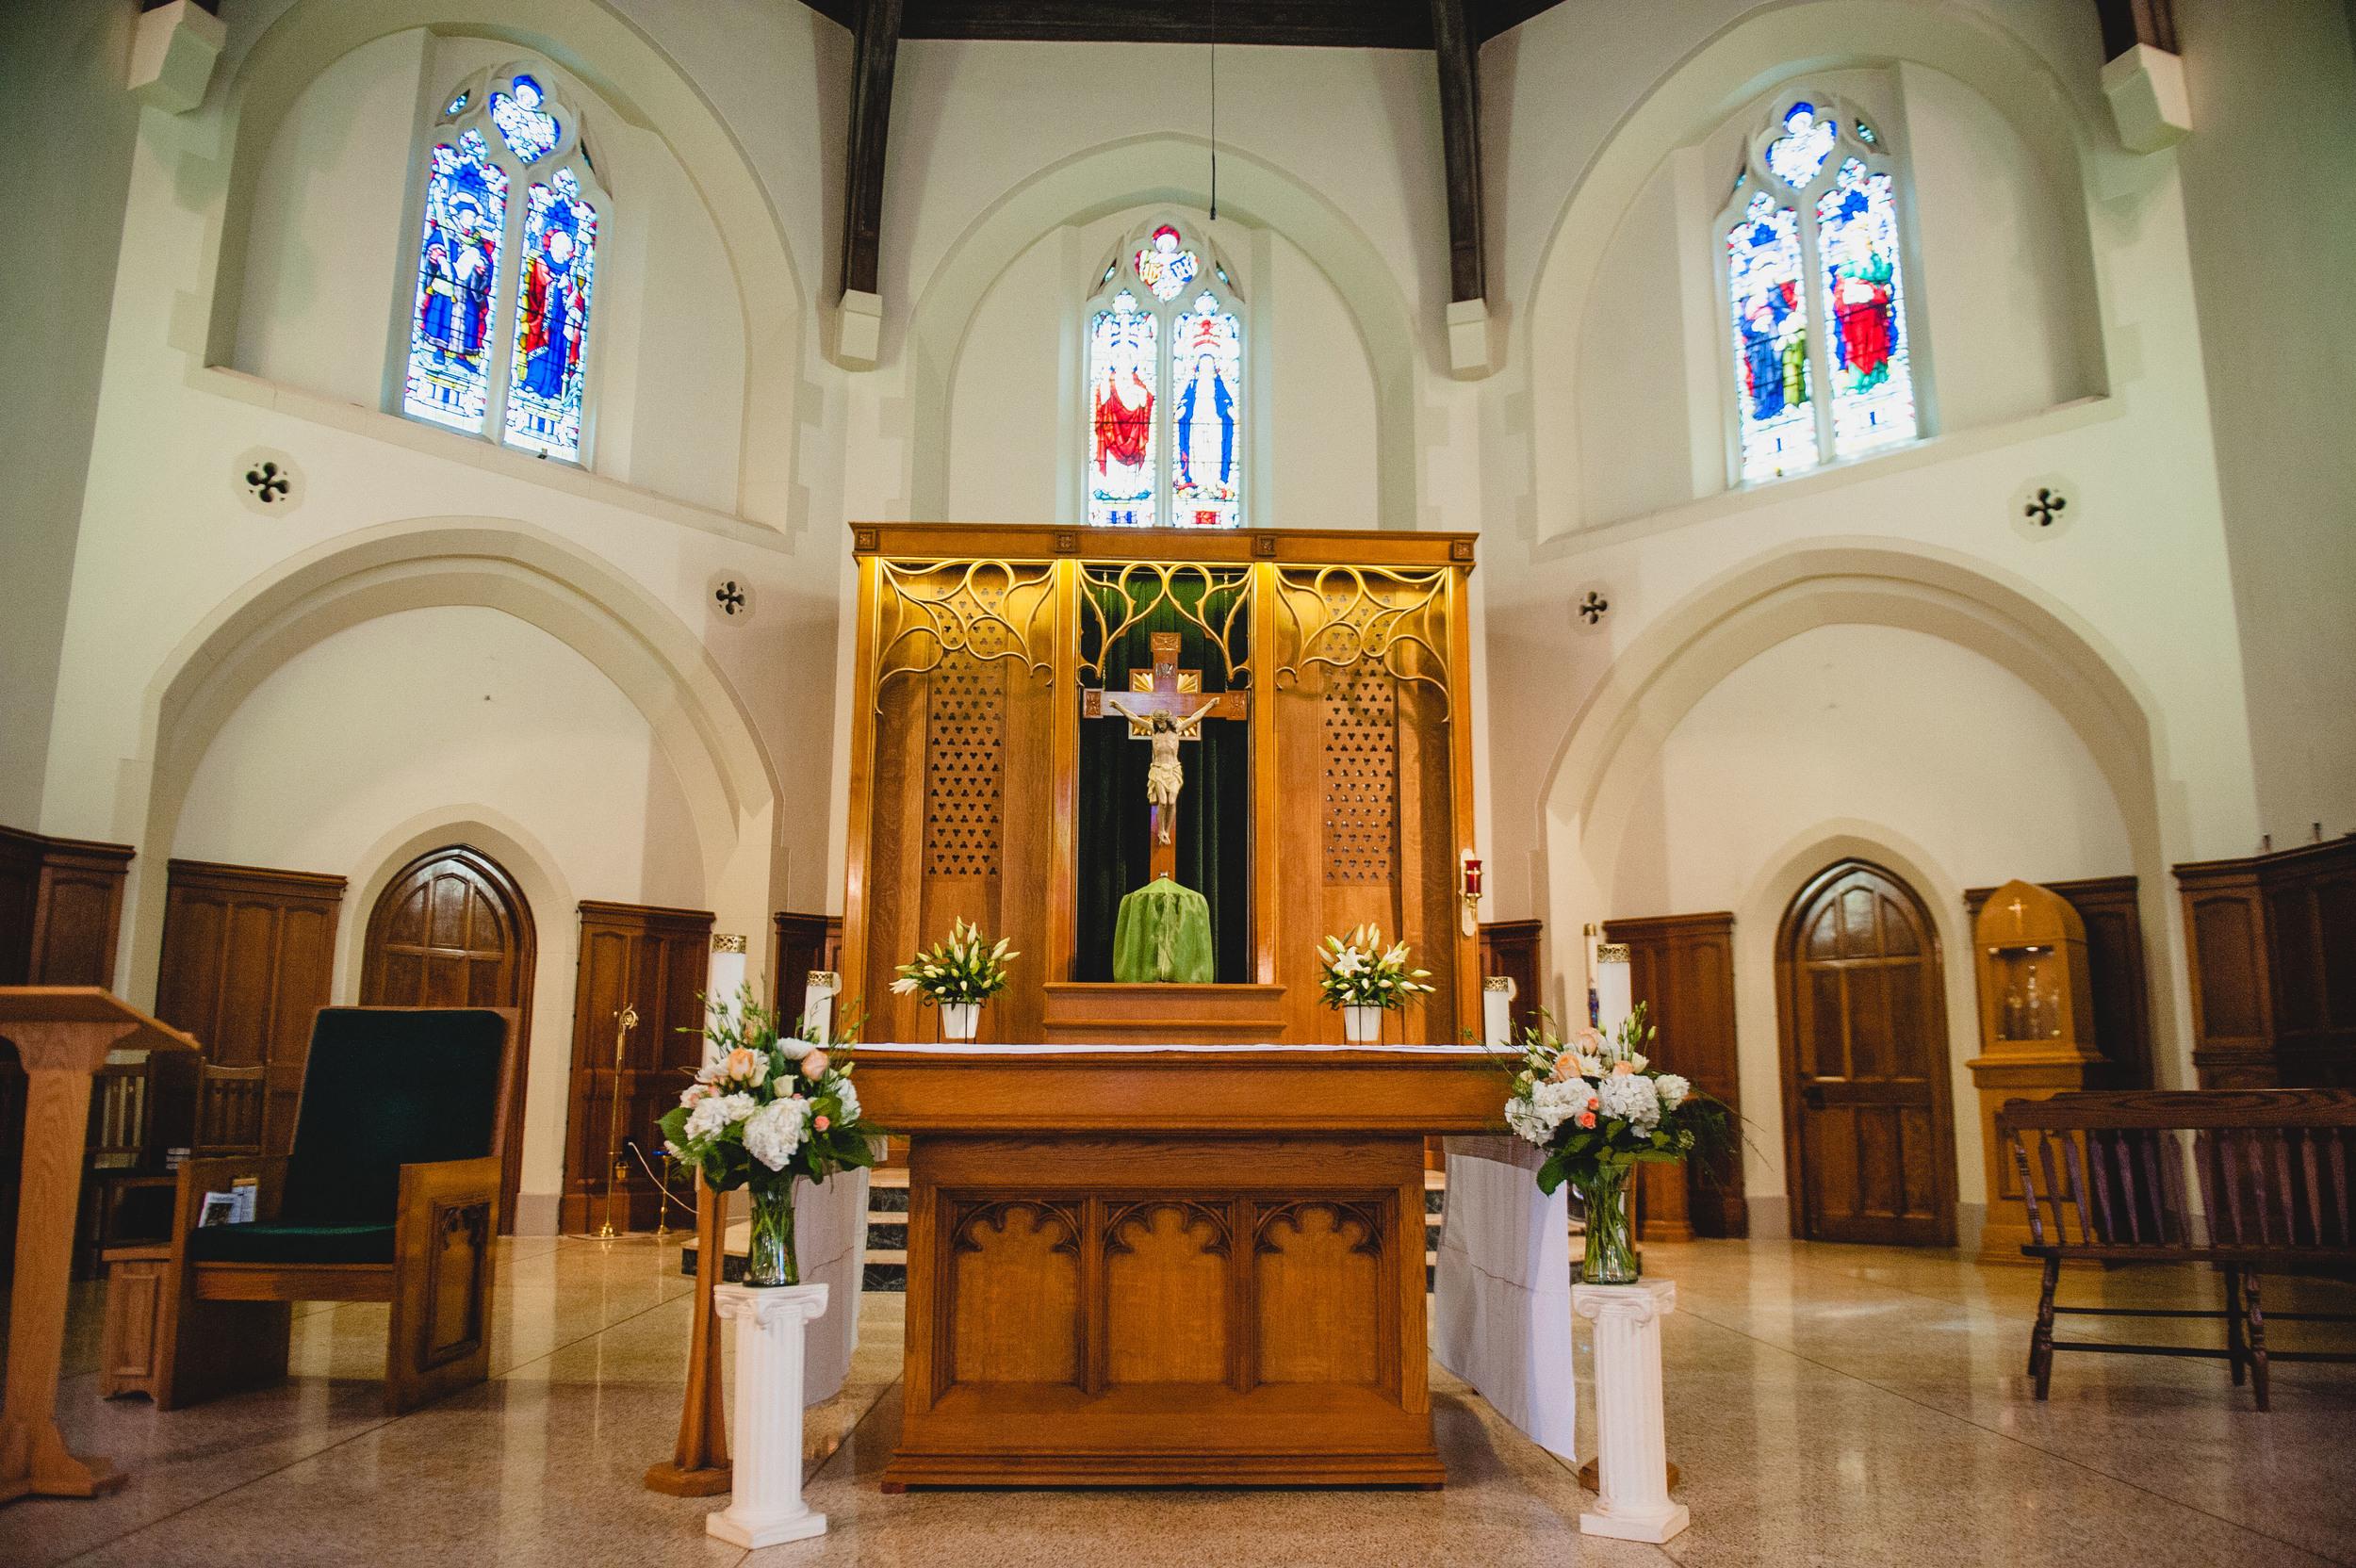 Vancouver St Augustine 's Church wedding photographer edward lai photography-26.jpg